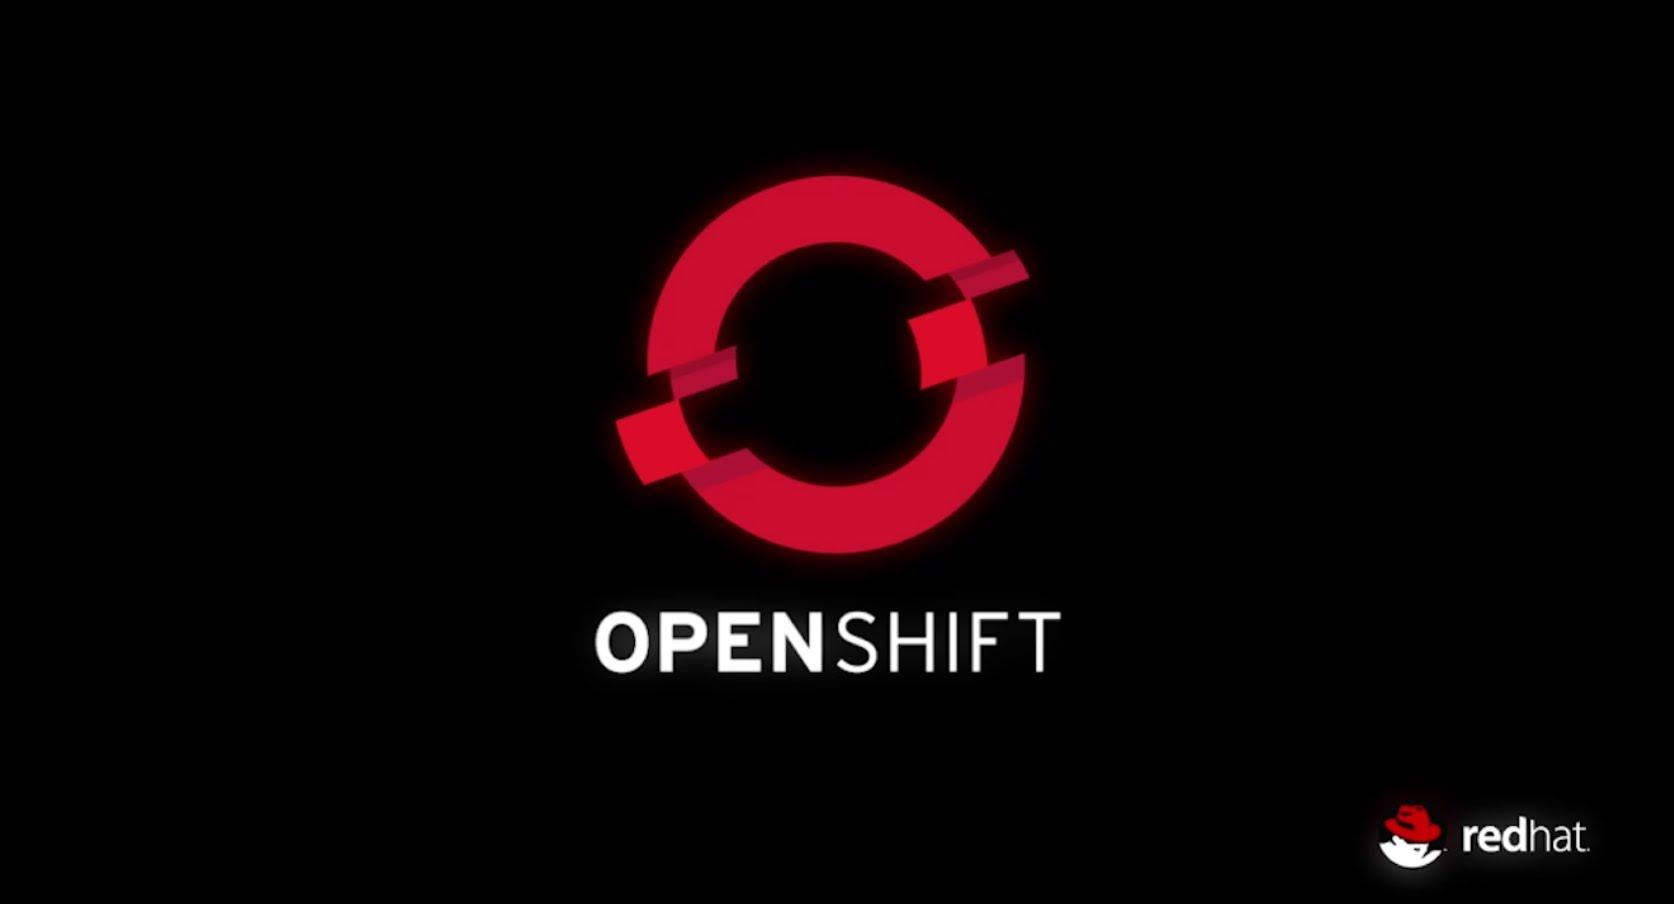 Openshift-logo